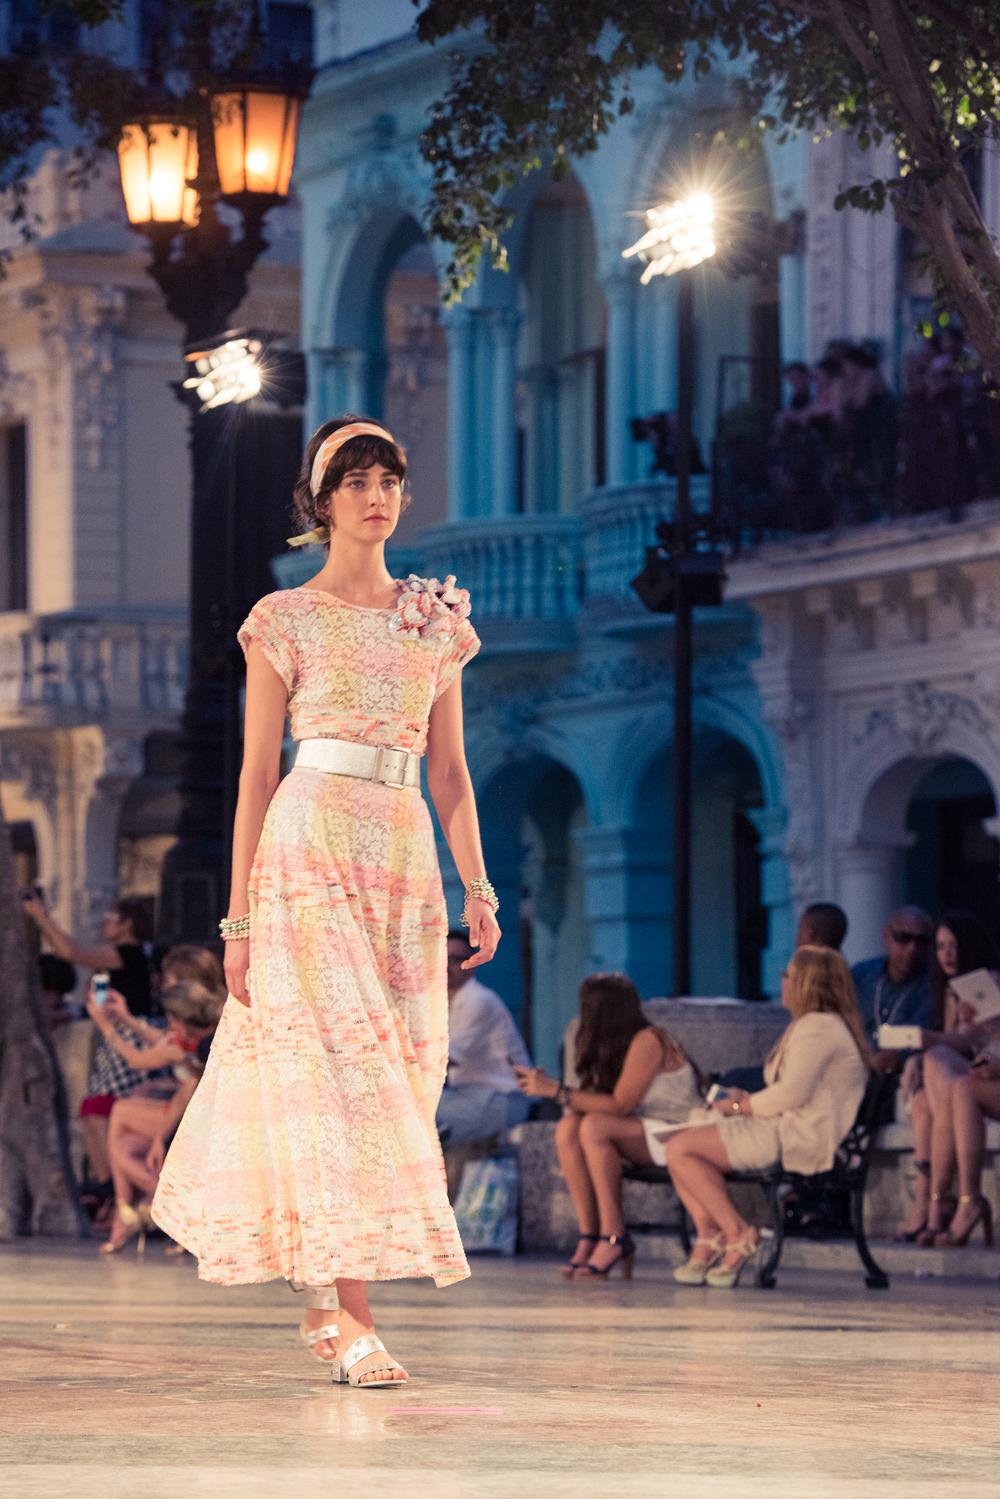 CHANEL_Cruise_Cuba_Show-93.jpg